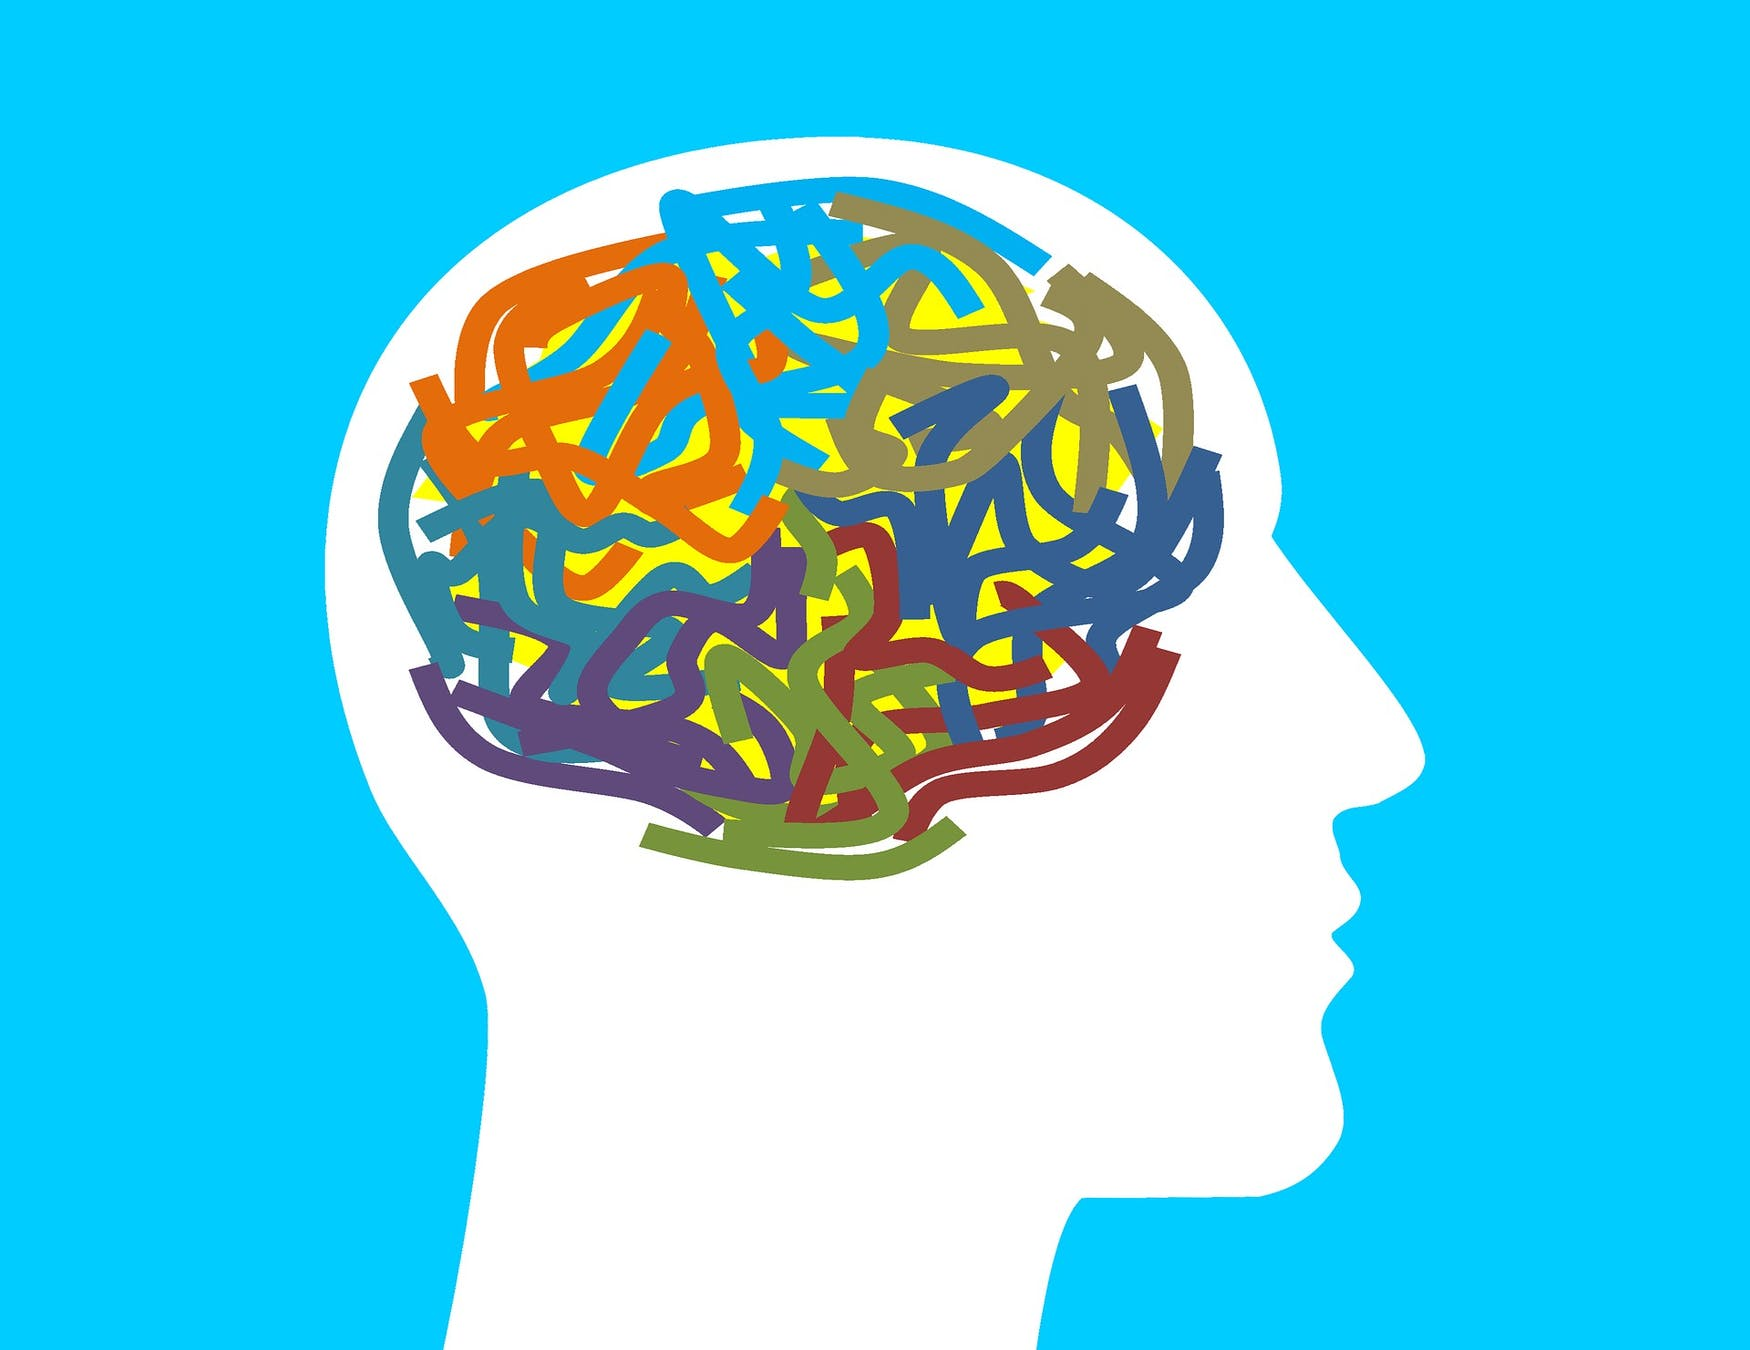 mental-health-3332122_1920.jpg